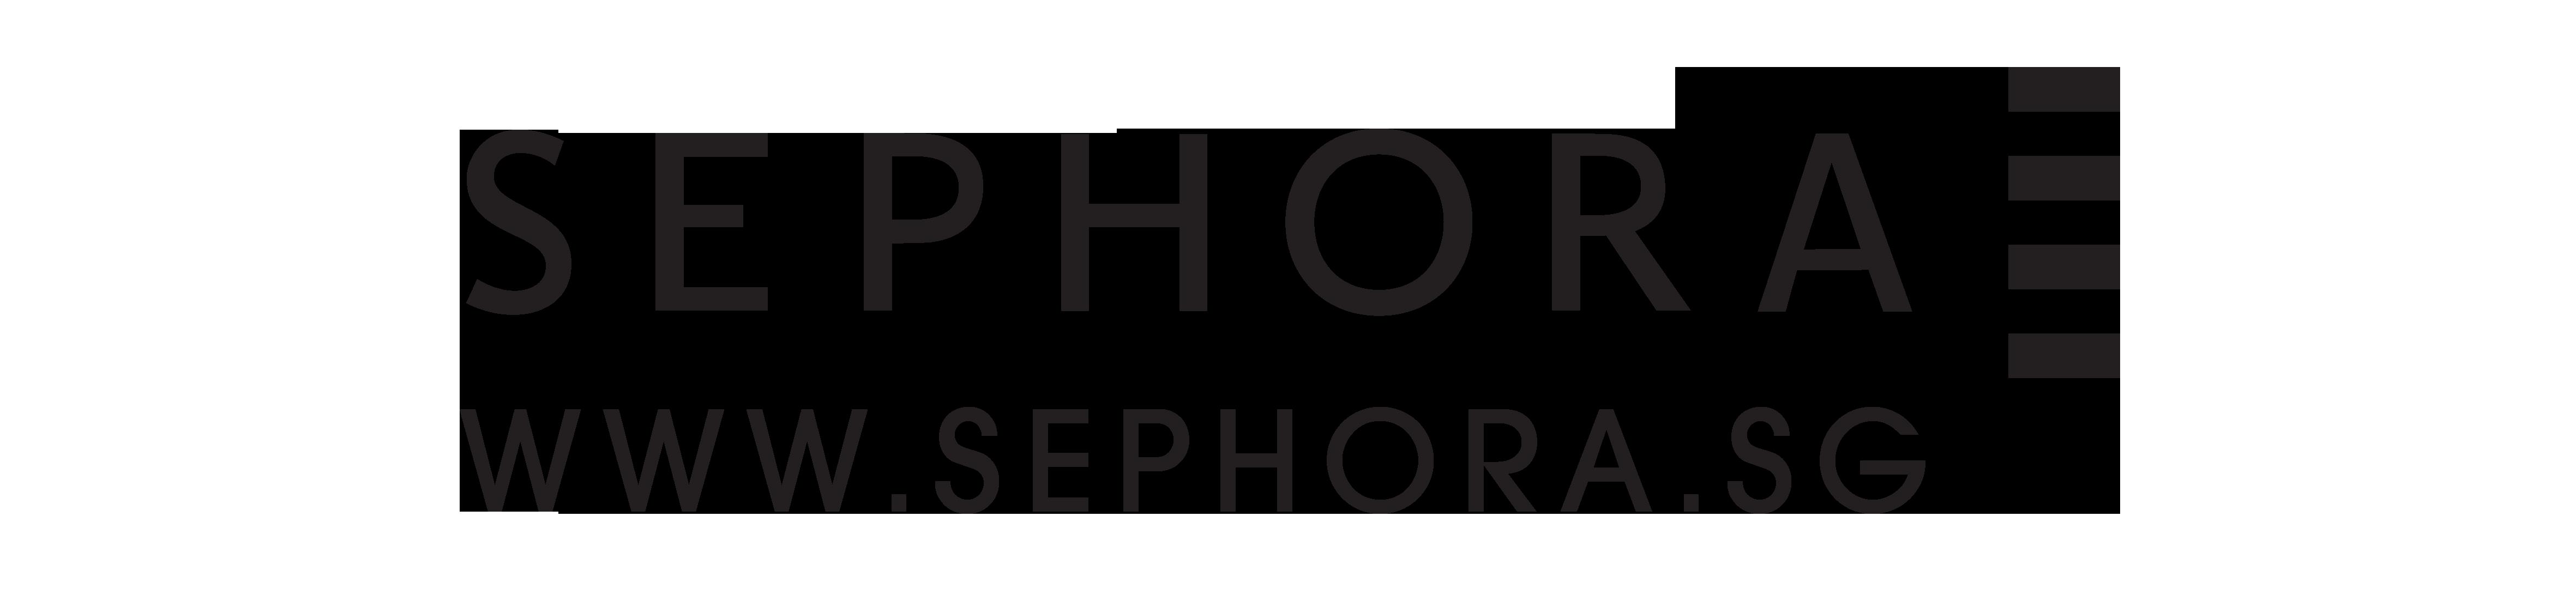 Discount Sephora